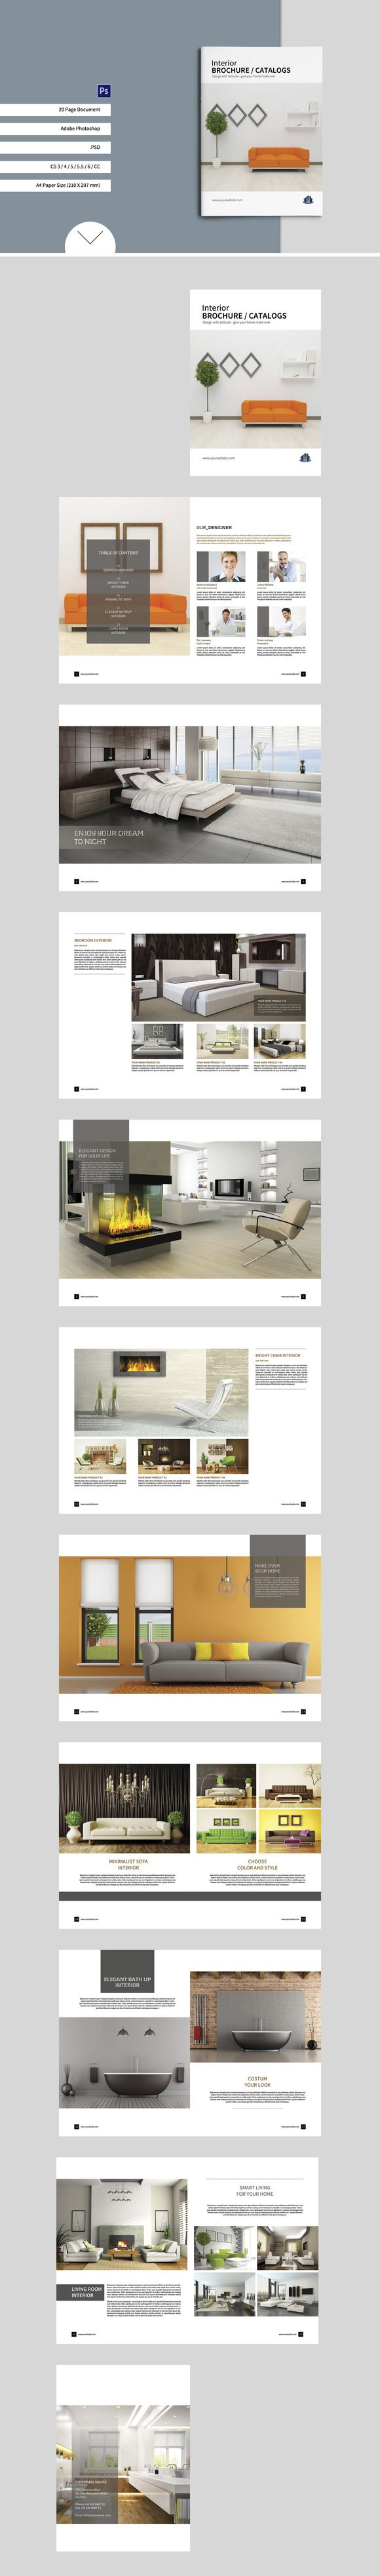 Interior Brochure / Catalogs by tujuhbenua on @creativemarket